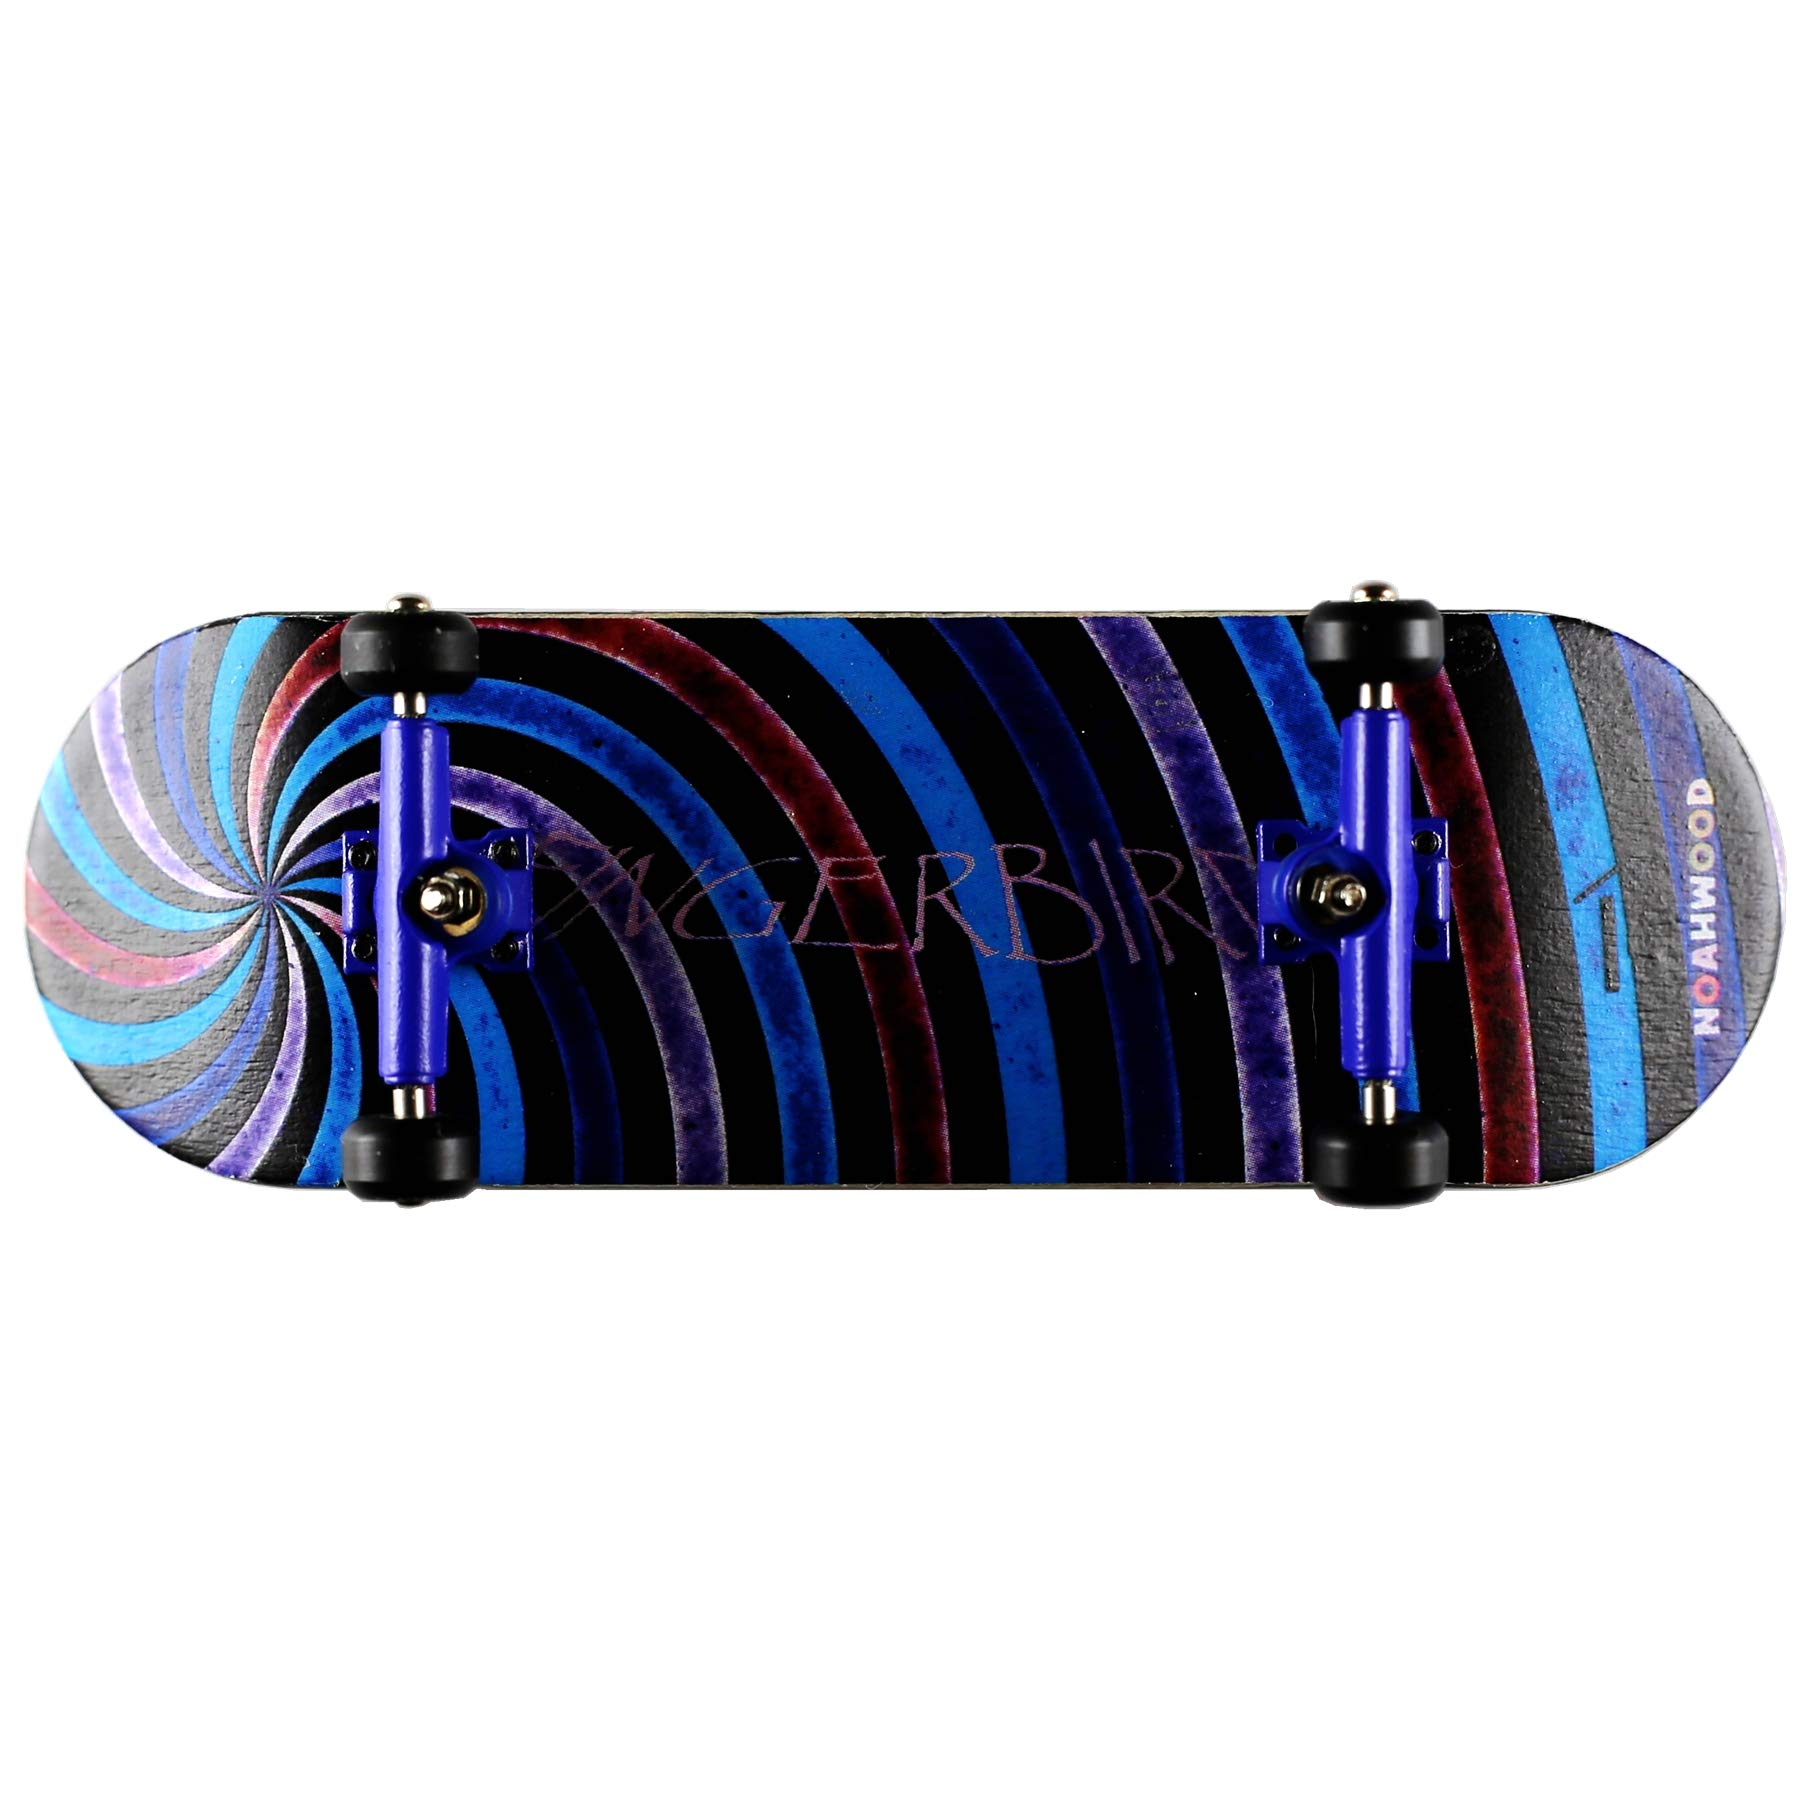 NOAHWOOD X Fingerbird Wooden PRO Fingerboards (Deck,Trucks,Wheels a Set) (Swirl i Set, 100x32mm)